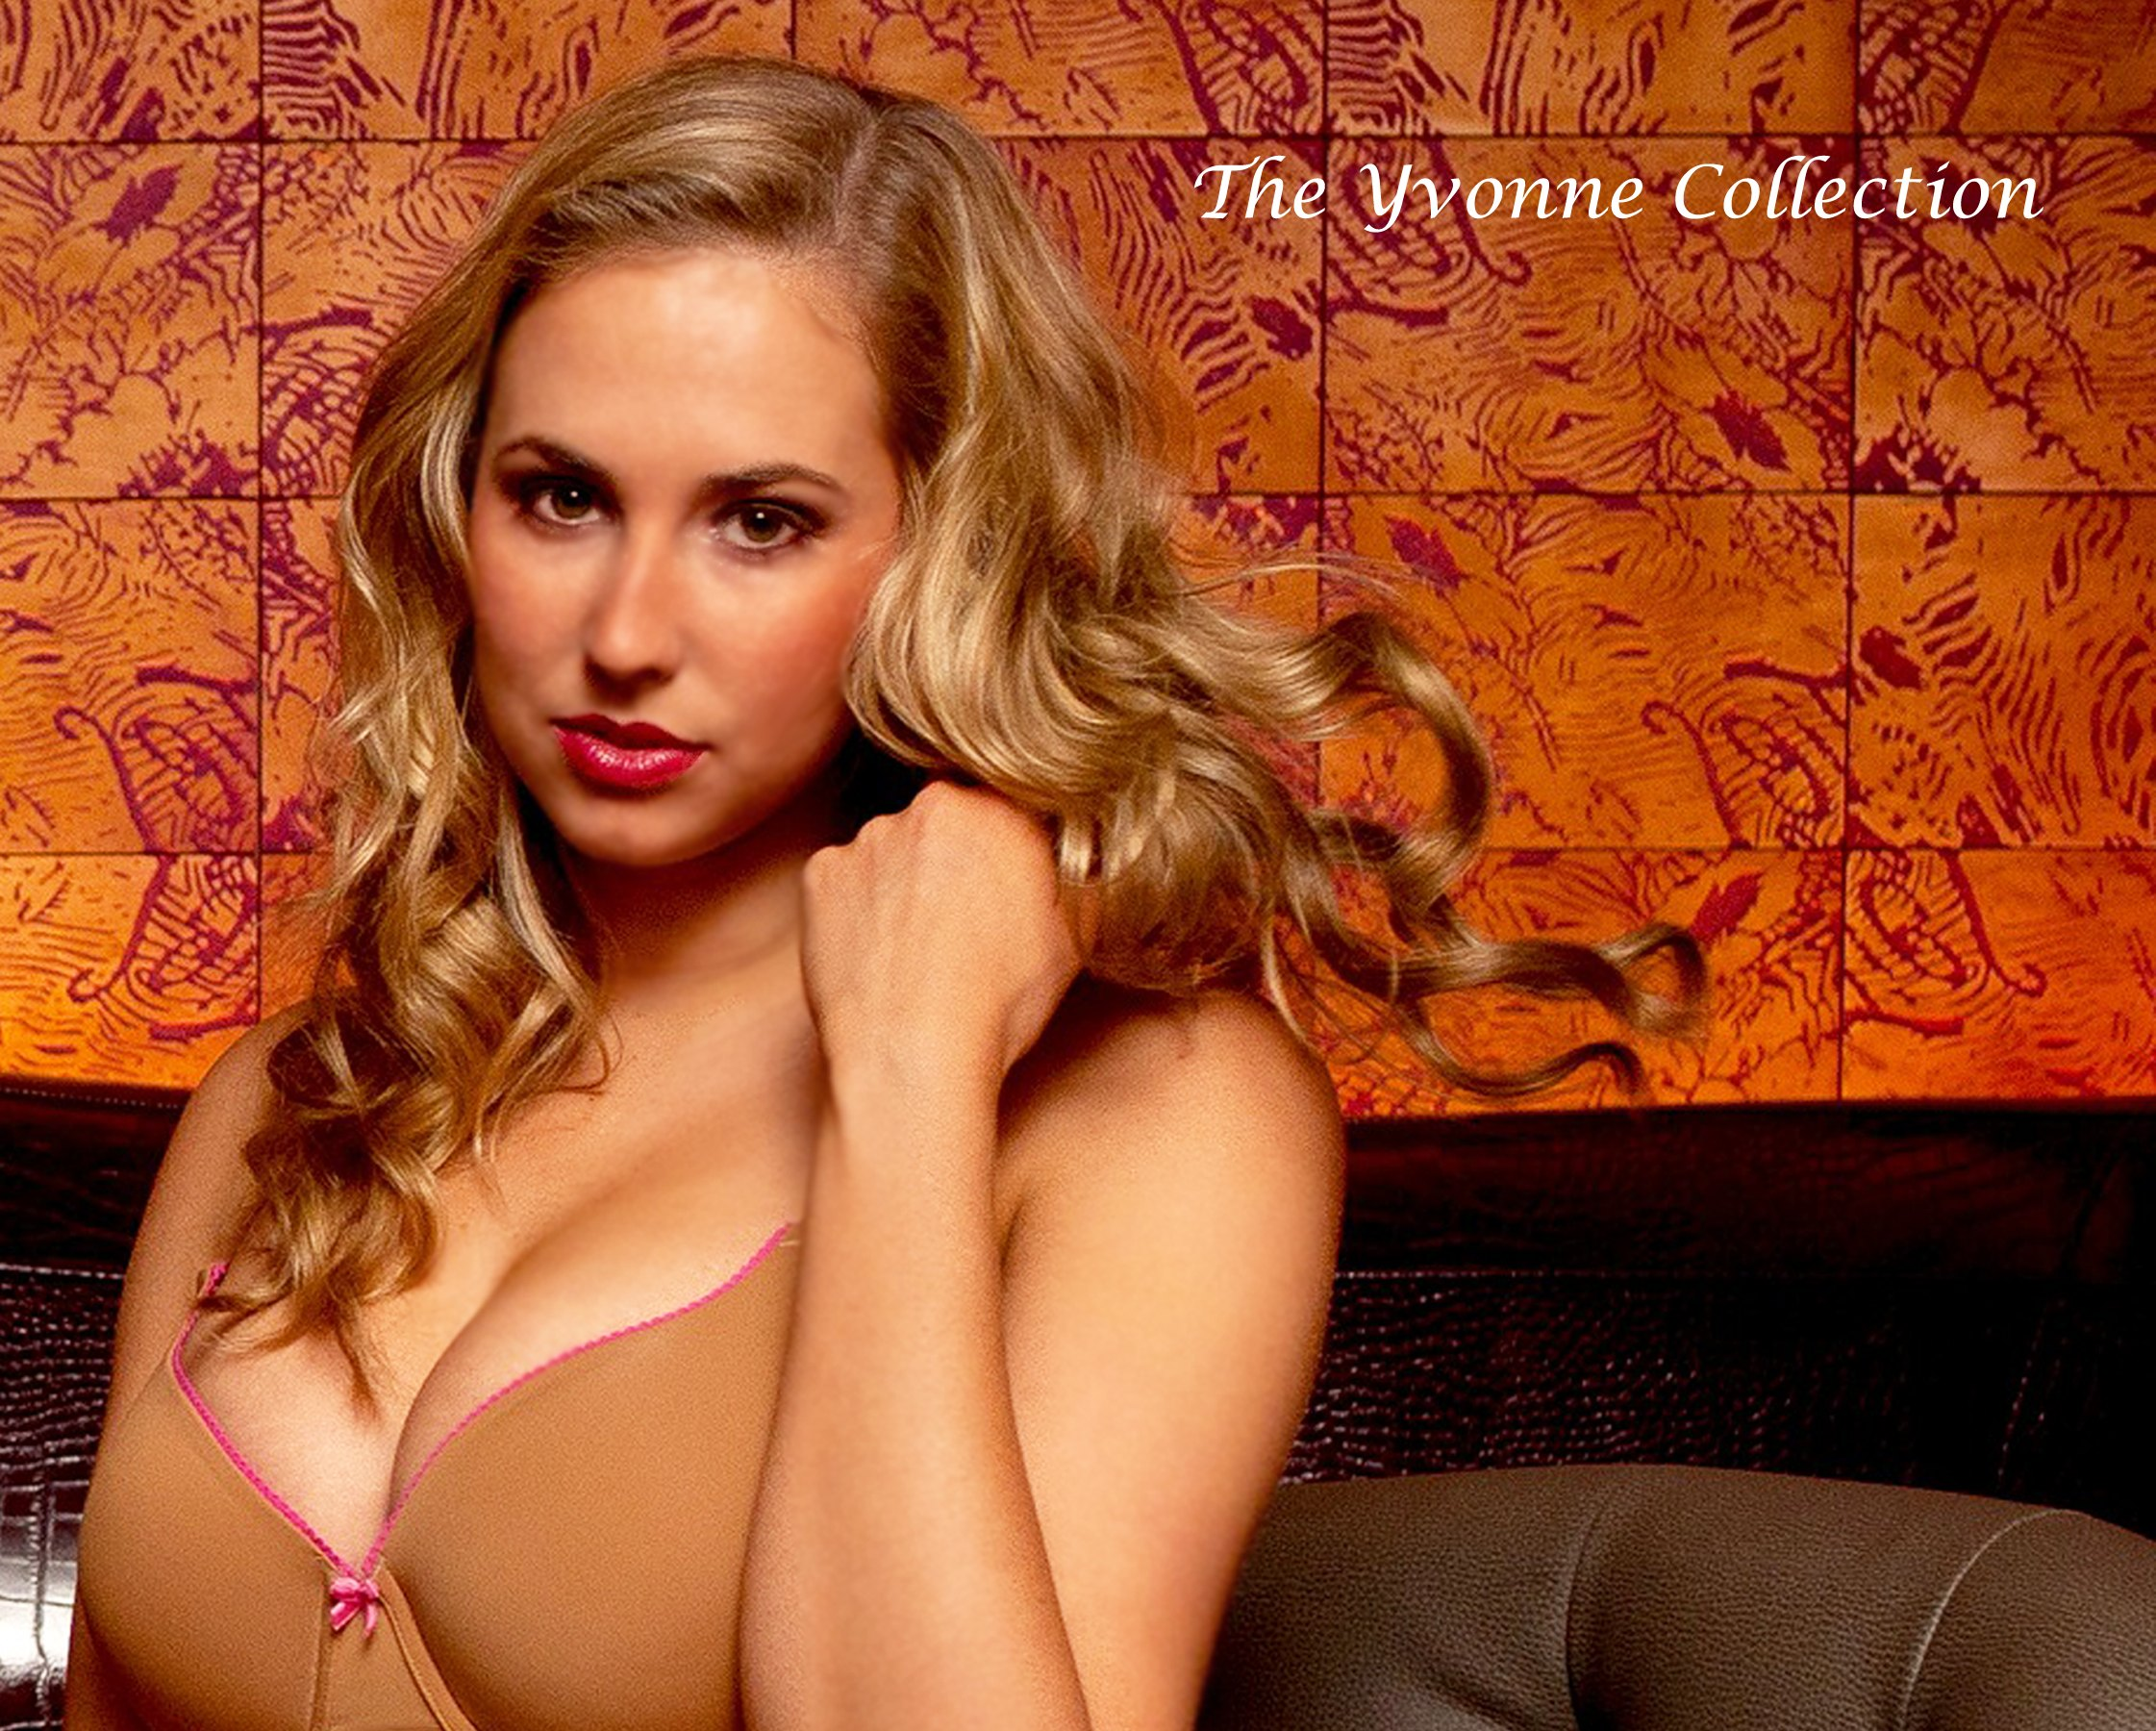 YvonneCaramel